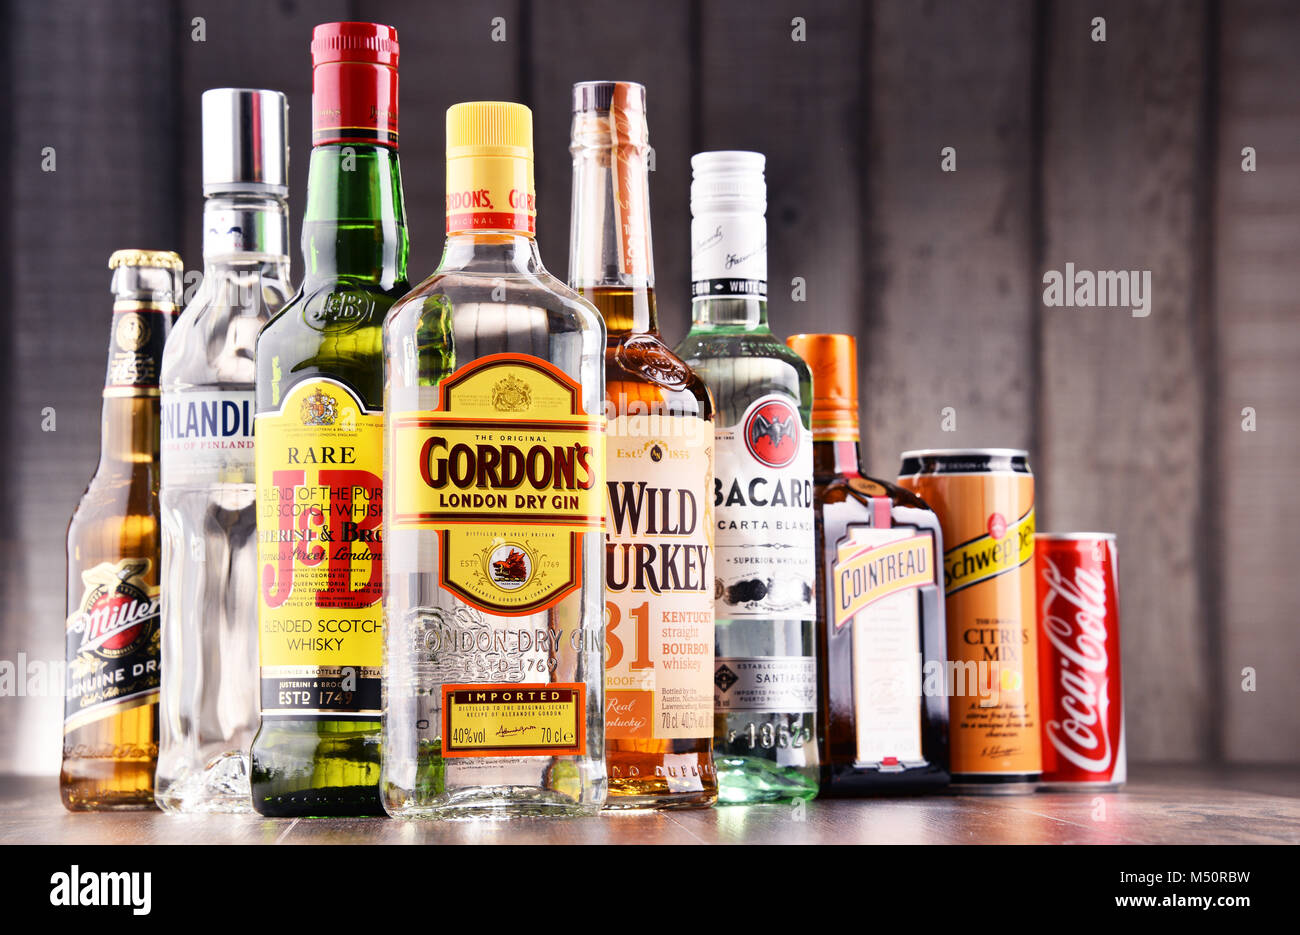 Assorted Alamy 175195325 - Stock Global Of Bottles Liquor Hard Brands Photo